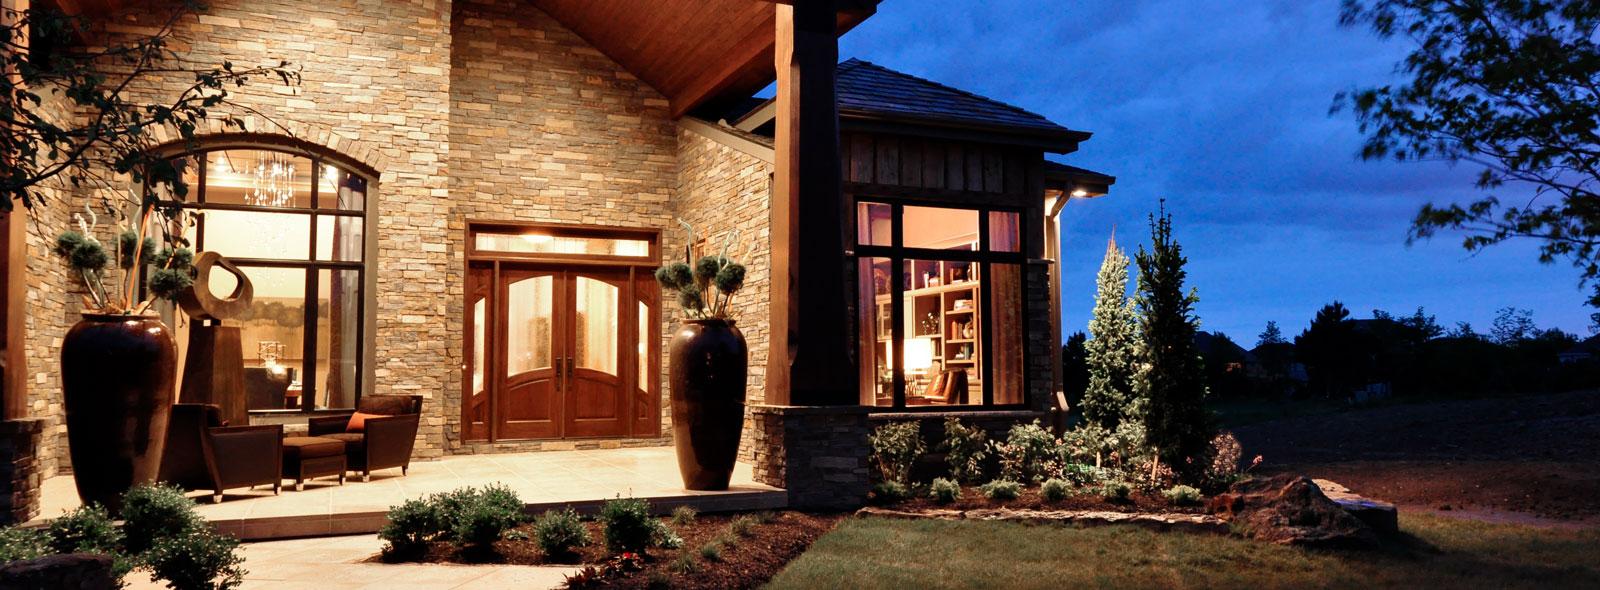 LA-Home-Builders-Lincoln-Nebraska-Front-Entryway-1600x590.jpg